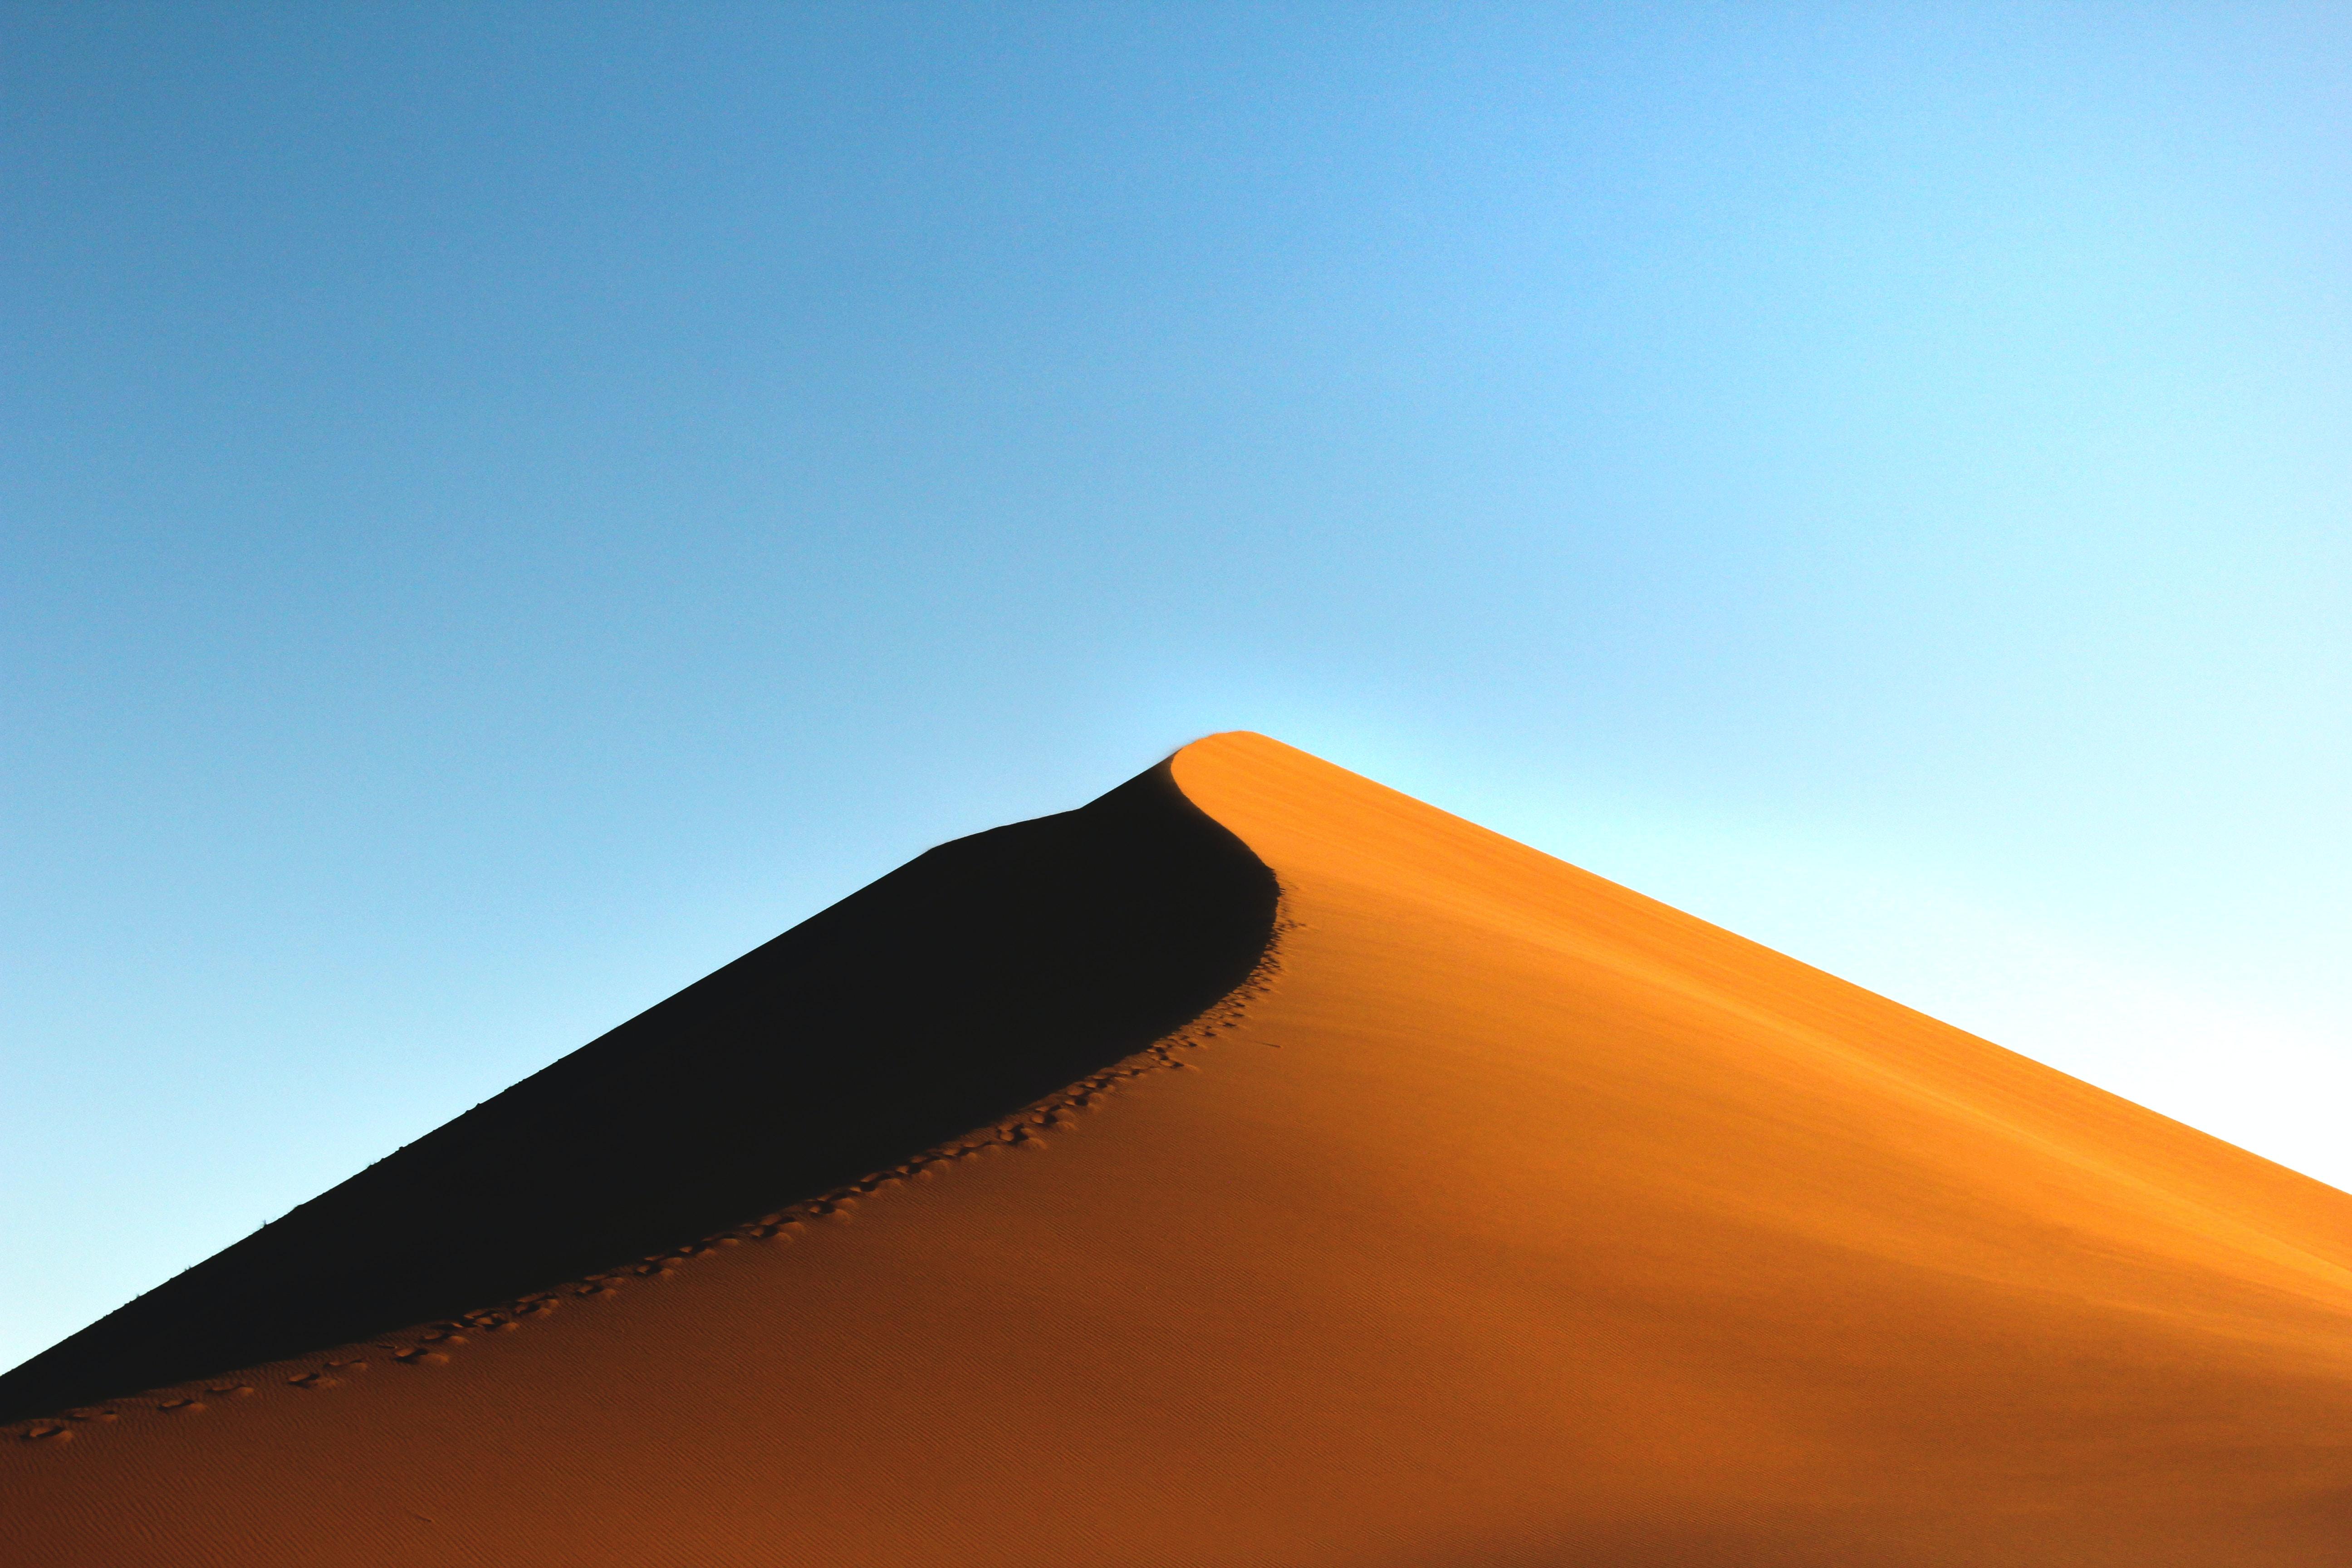 sand dune during daytime